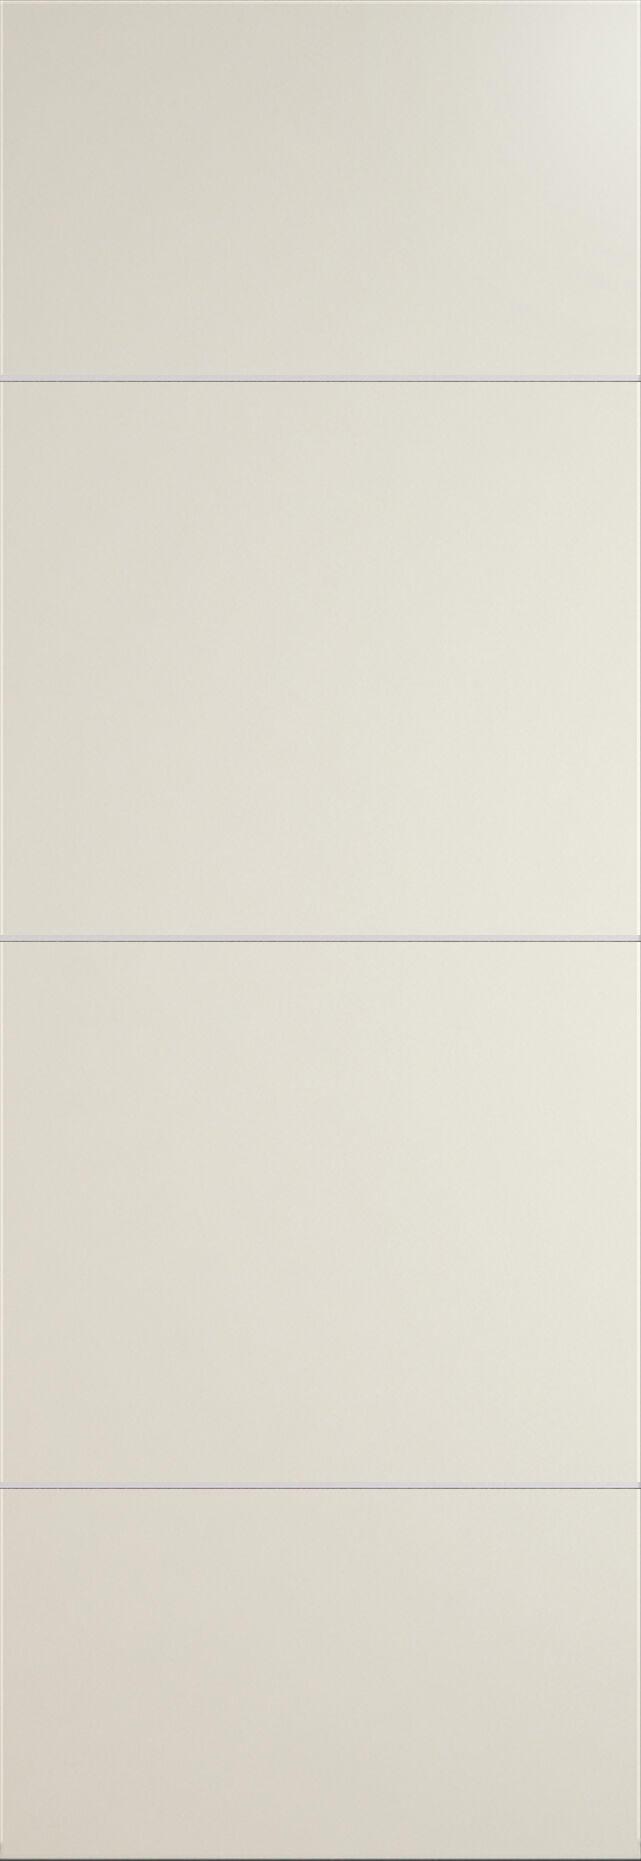 Tivoli Г-3 Invisible цвет - Жемчужная эмаль Без стекла (ДГ)